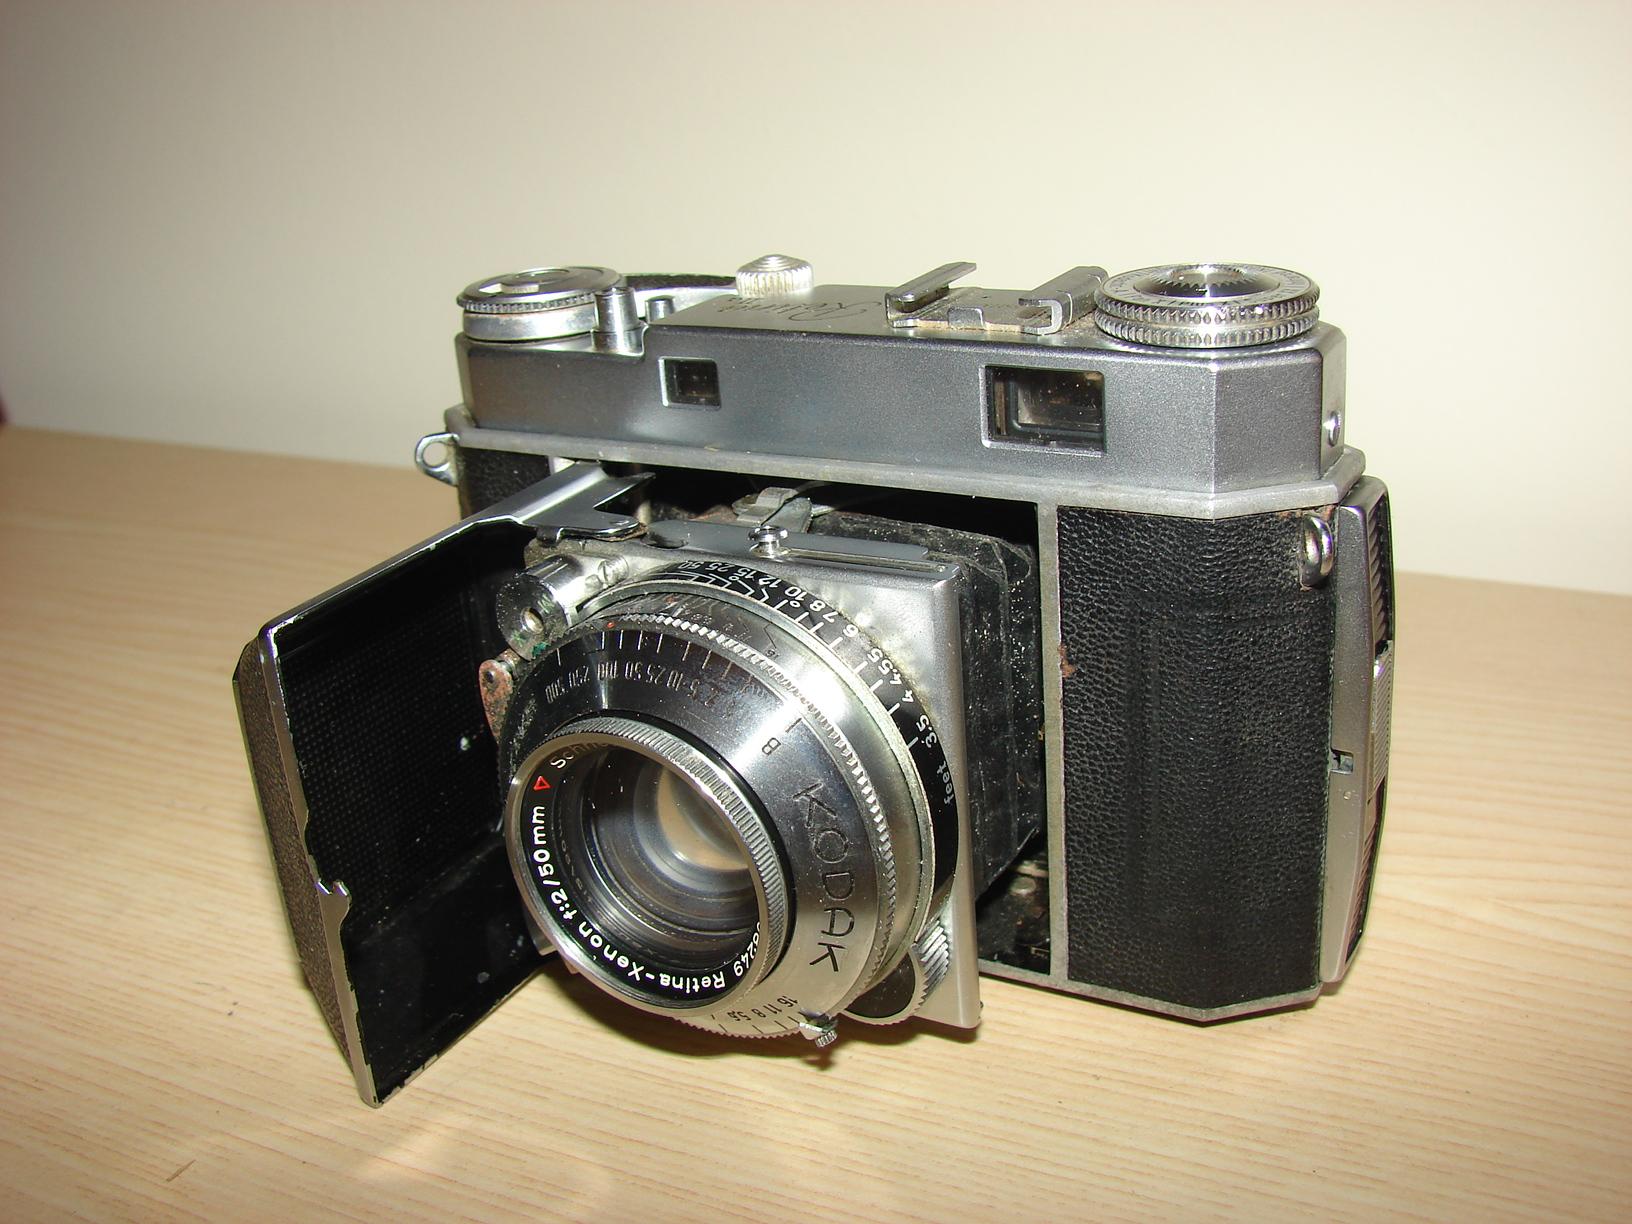 1949-56 retina iia 35mm camera.jpg